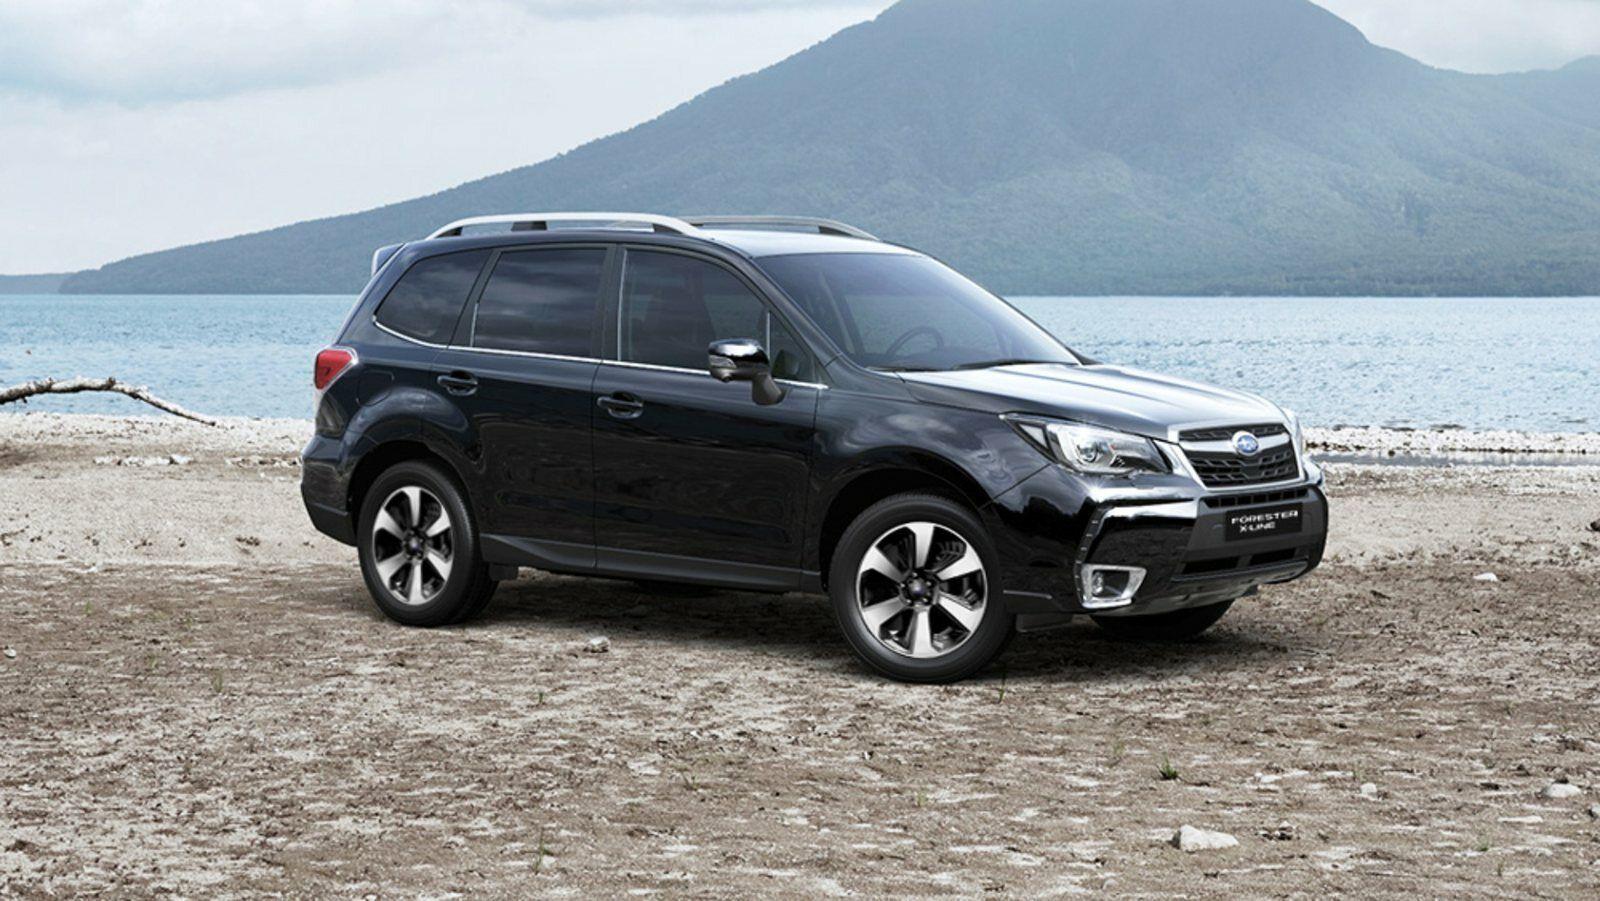 Subaru Forester 2,0 X-line XS L-tr. 5d